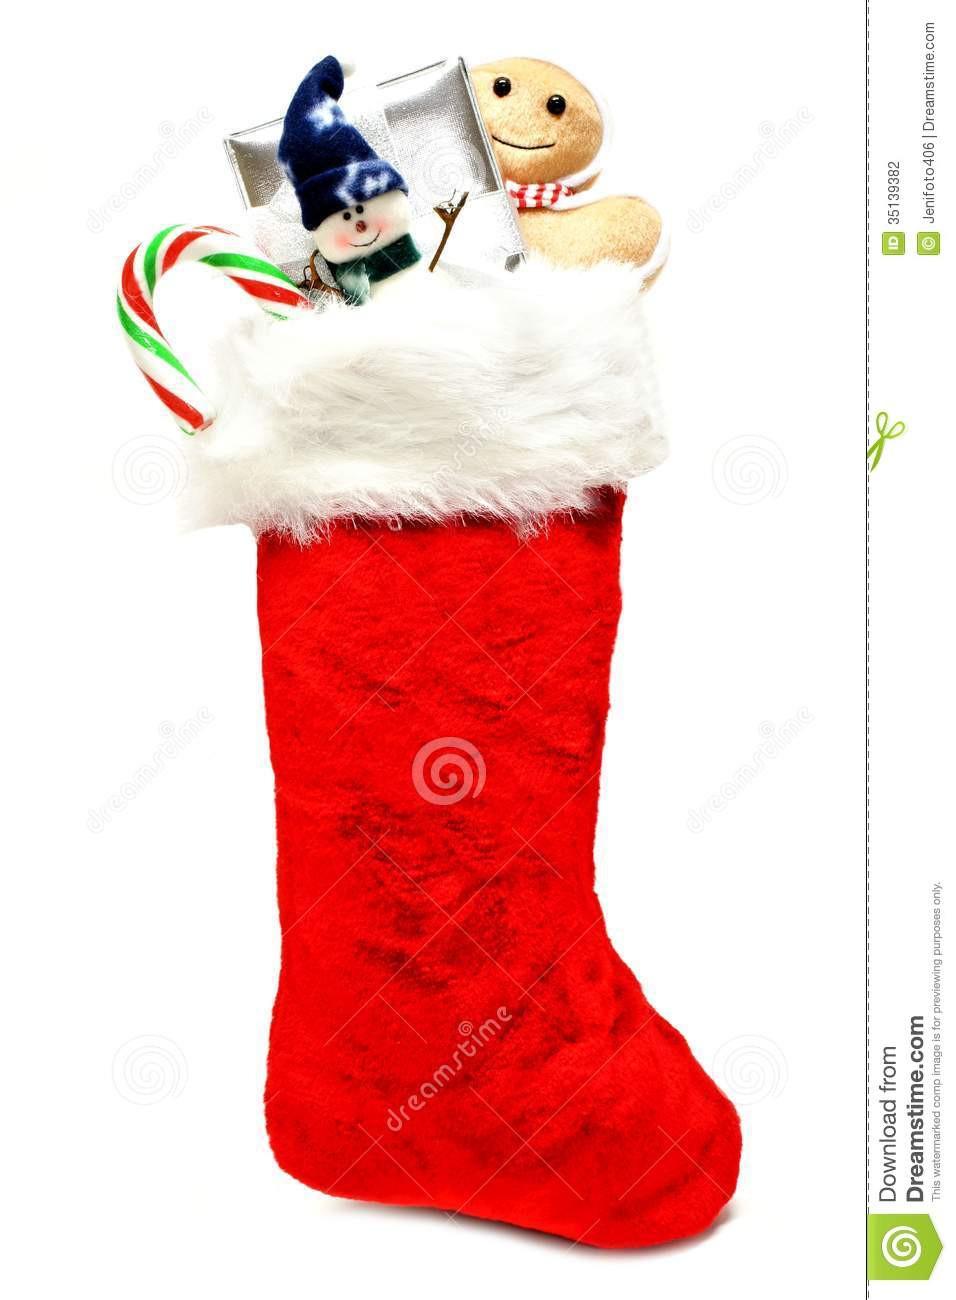 Candy Filled Christmas Stockings  Christmas stocking stock photo Image of ts festive